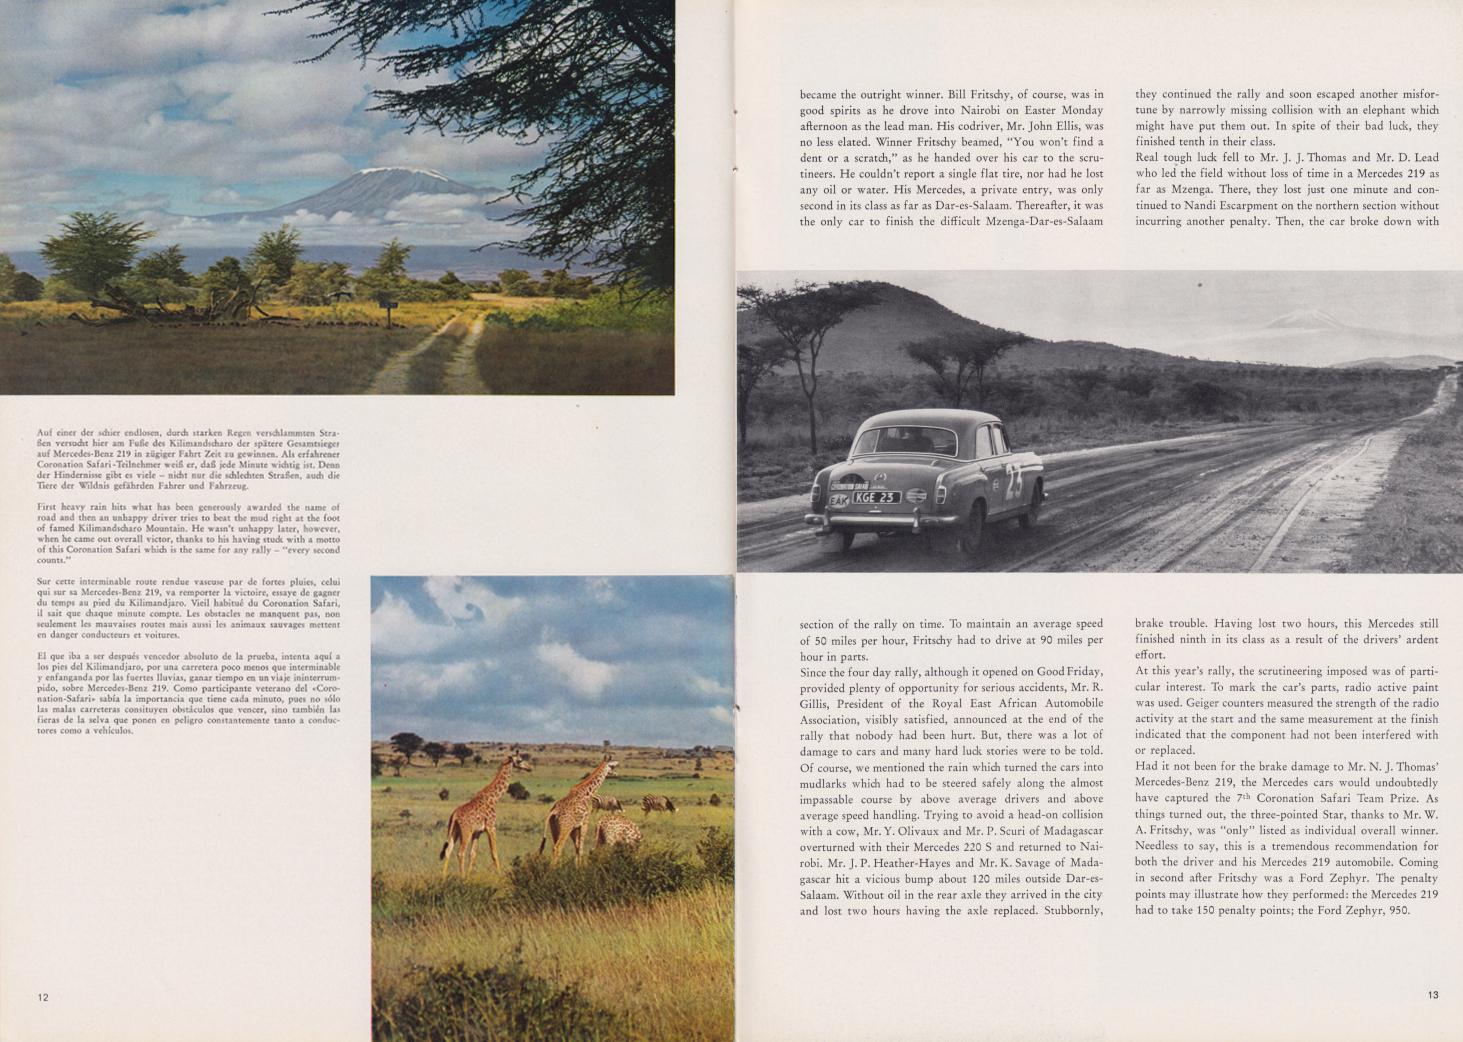 (REVISTA): Periódico In aller welt n.º 33 - Mercedes-Benz no mundo - 1959 - multilingue 007